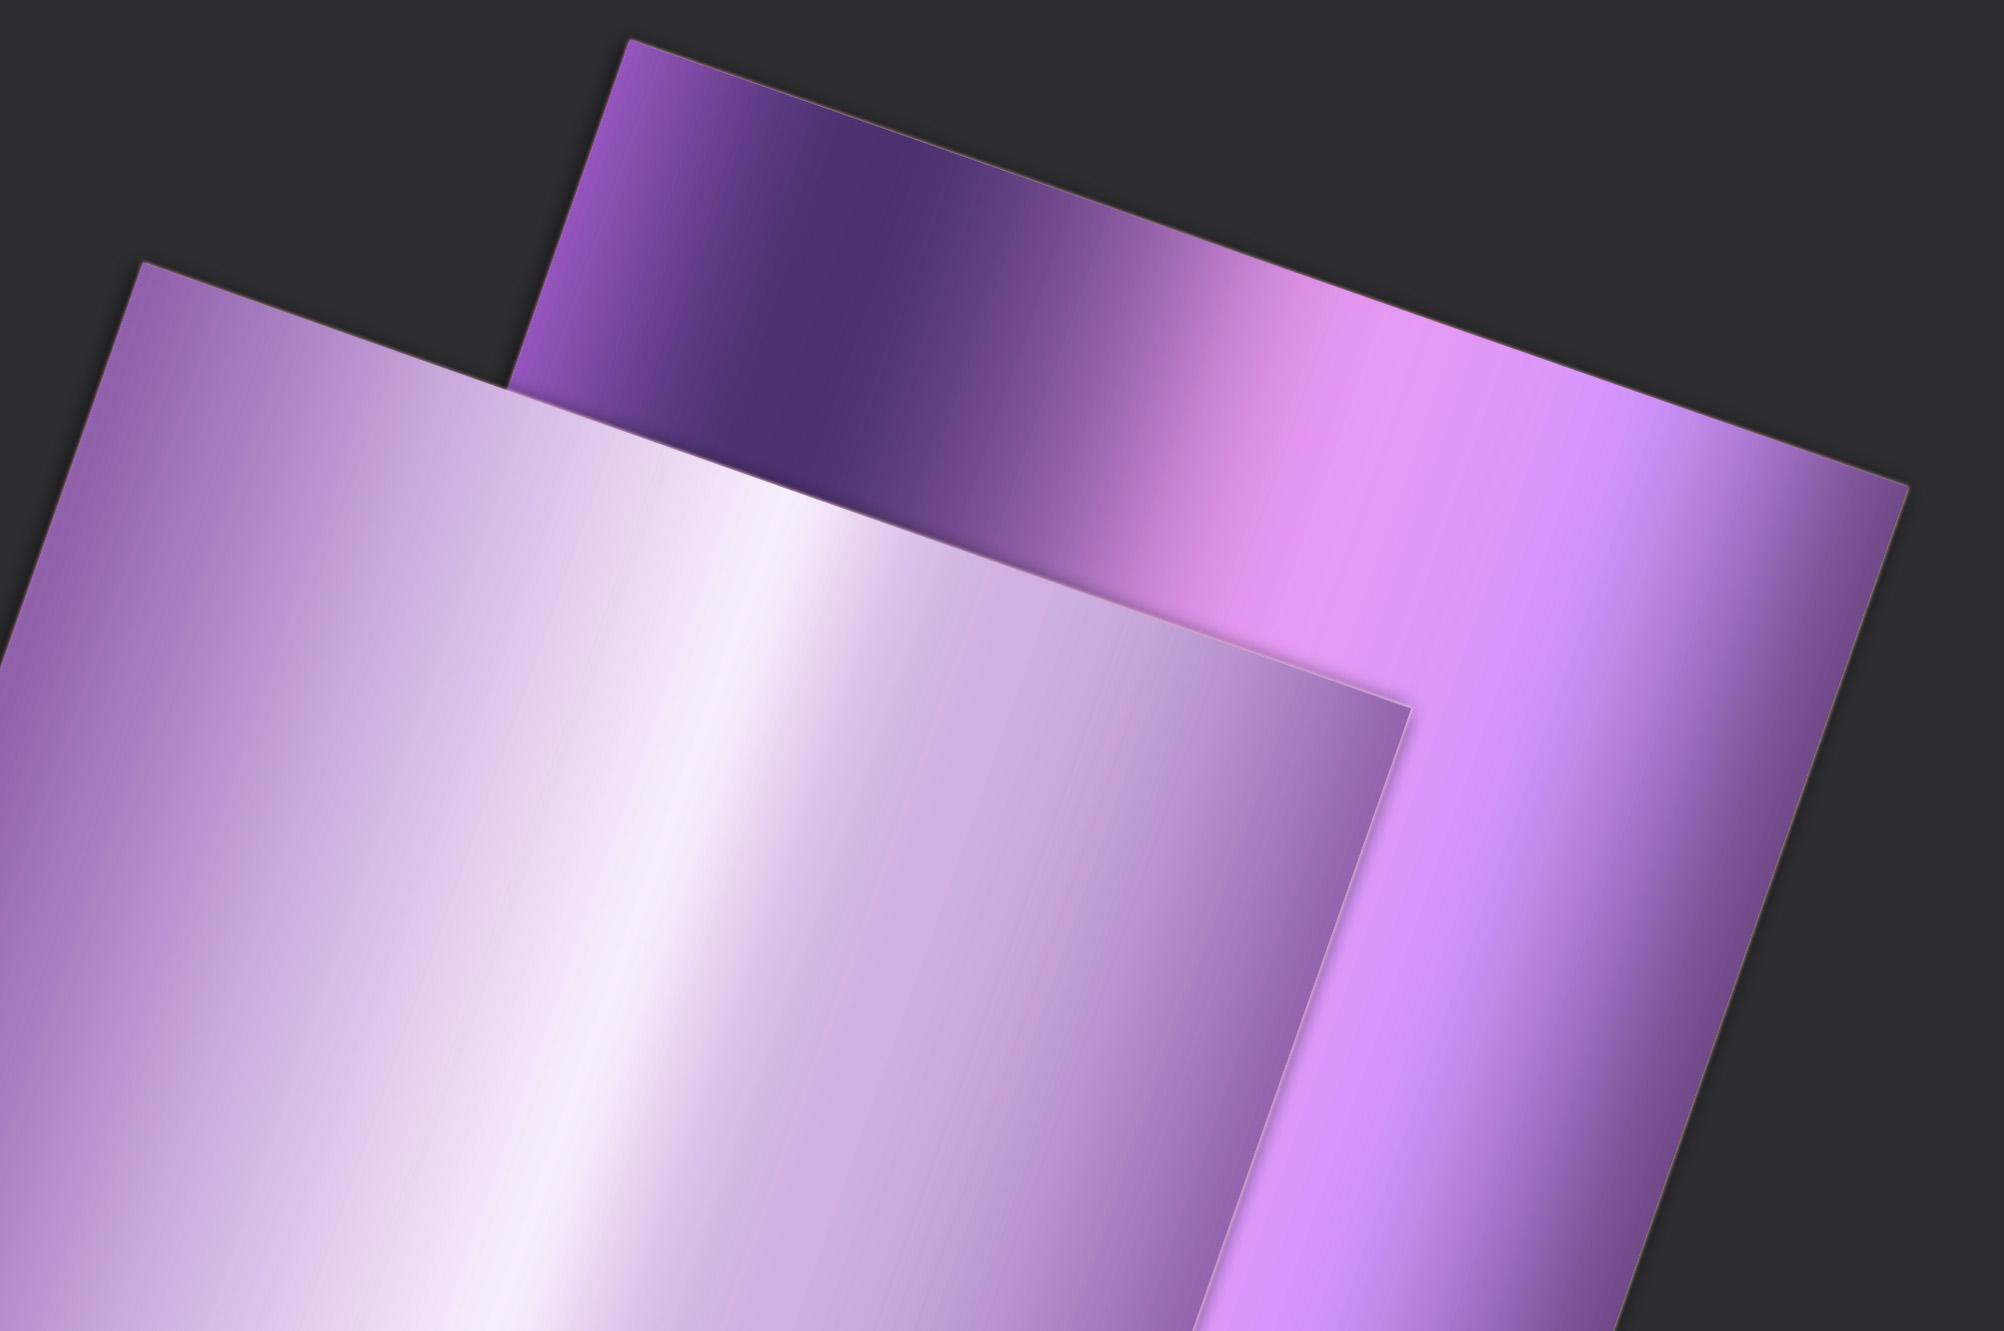 Purple Foil Textures example image 3